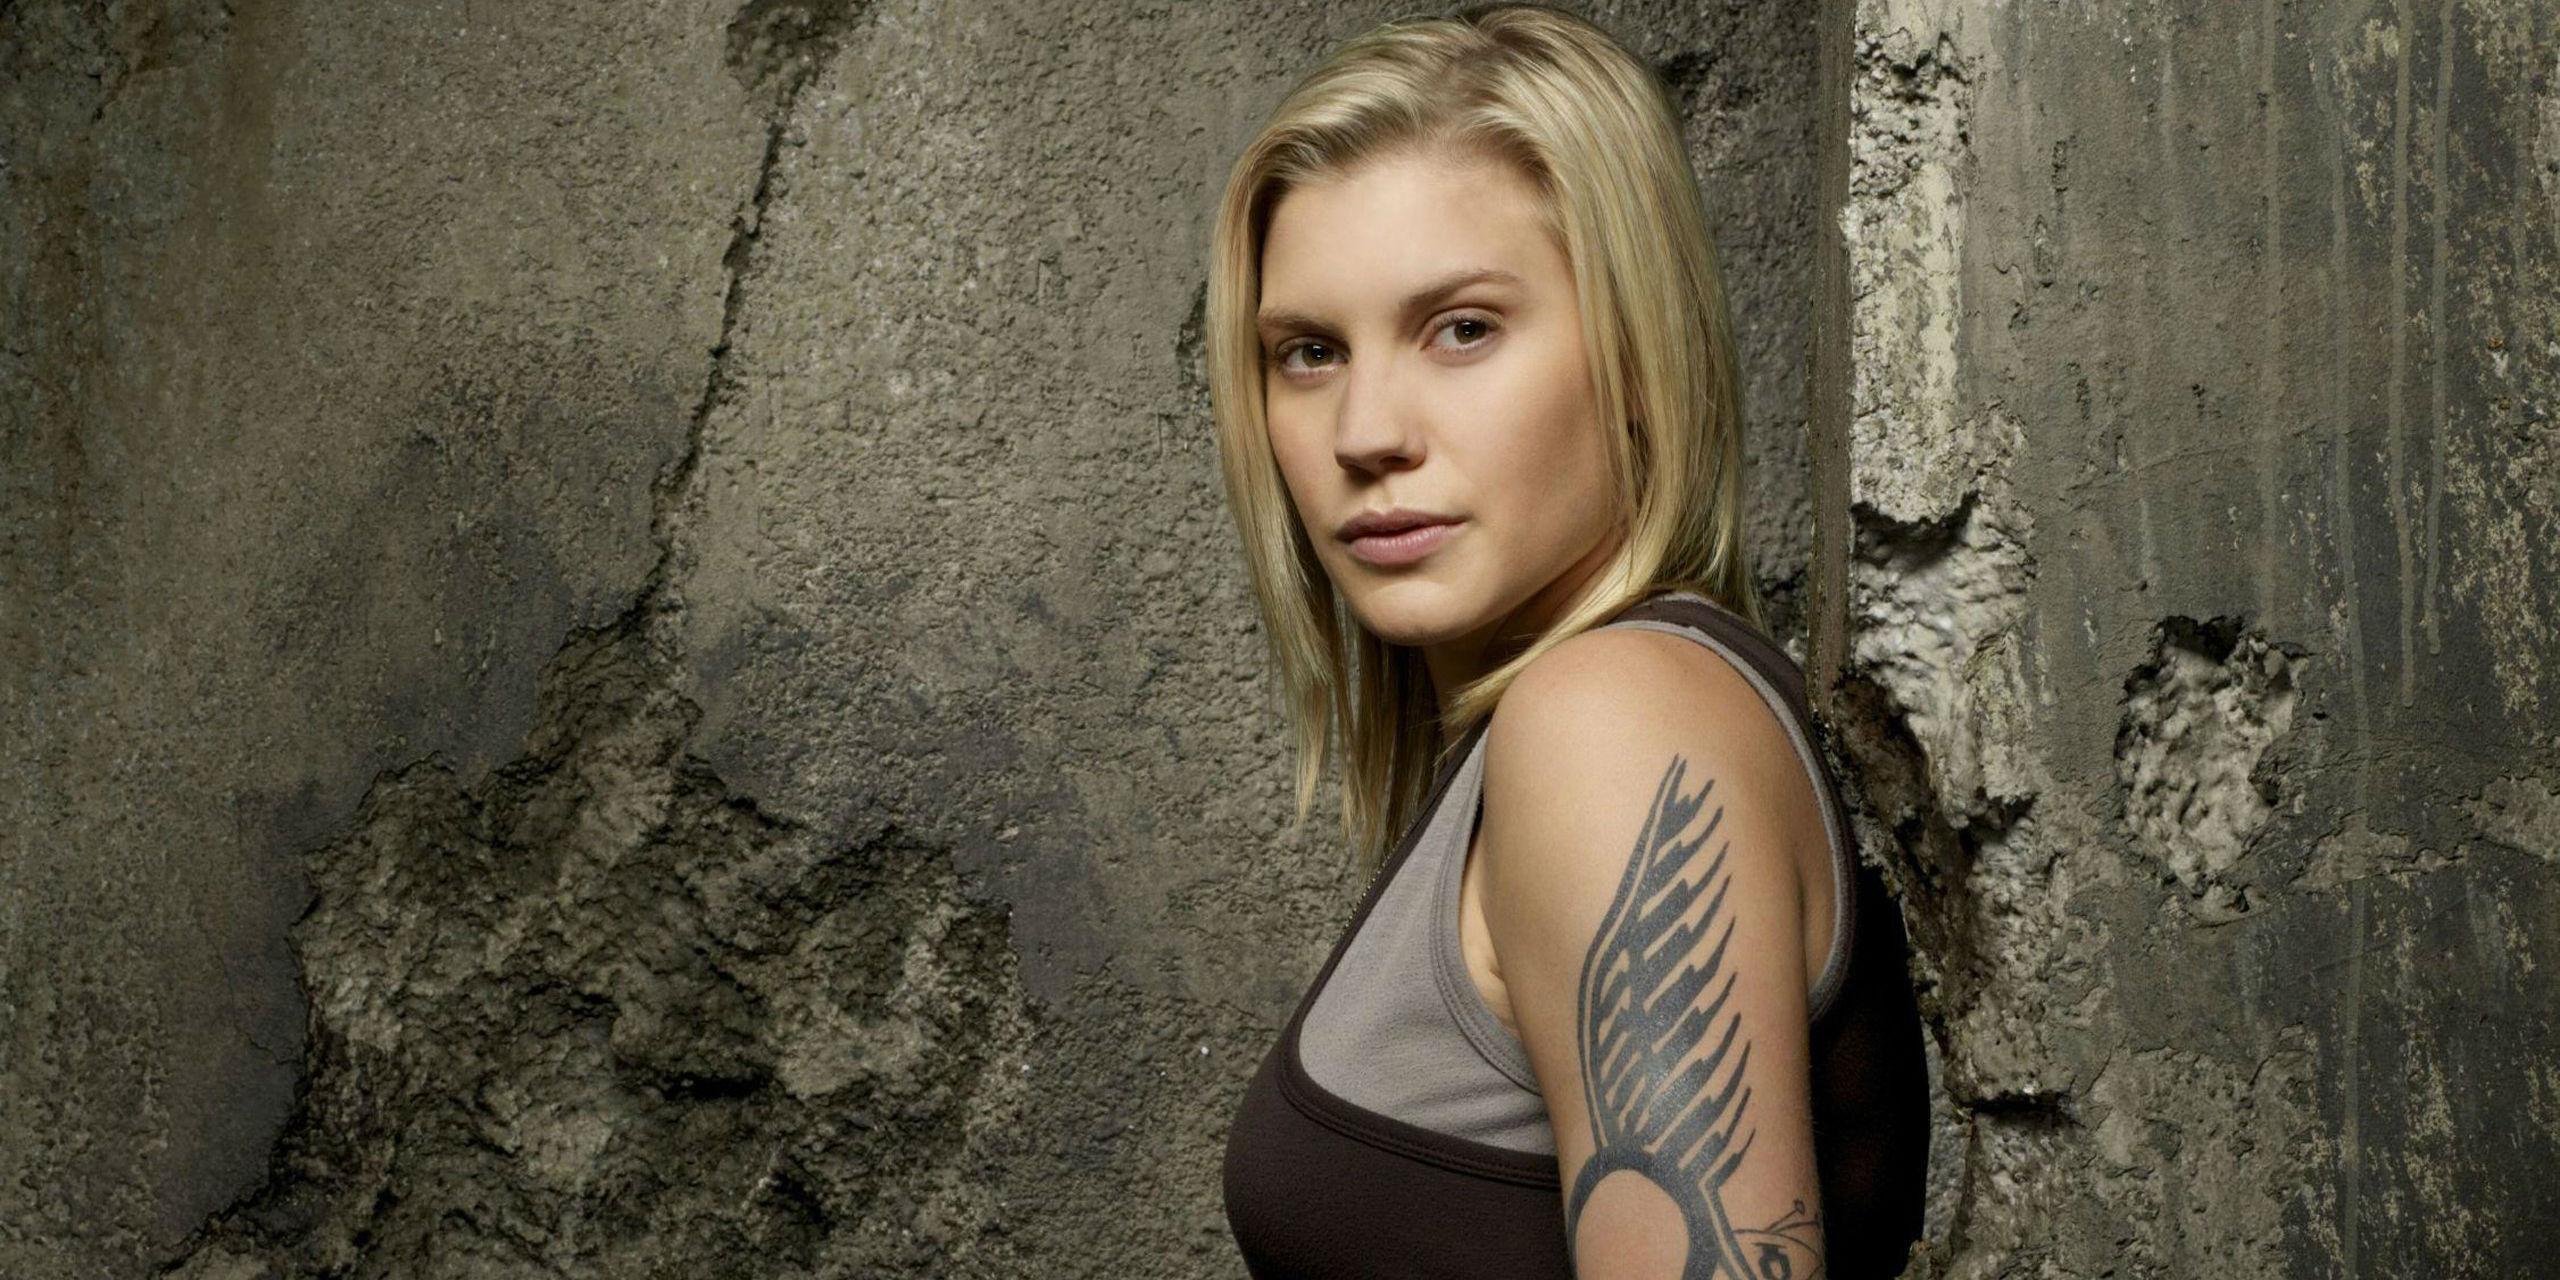 Kara Starbuck Thrace in Battlestar Galactica